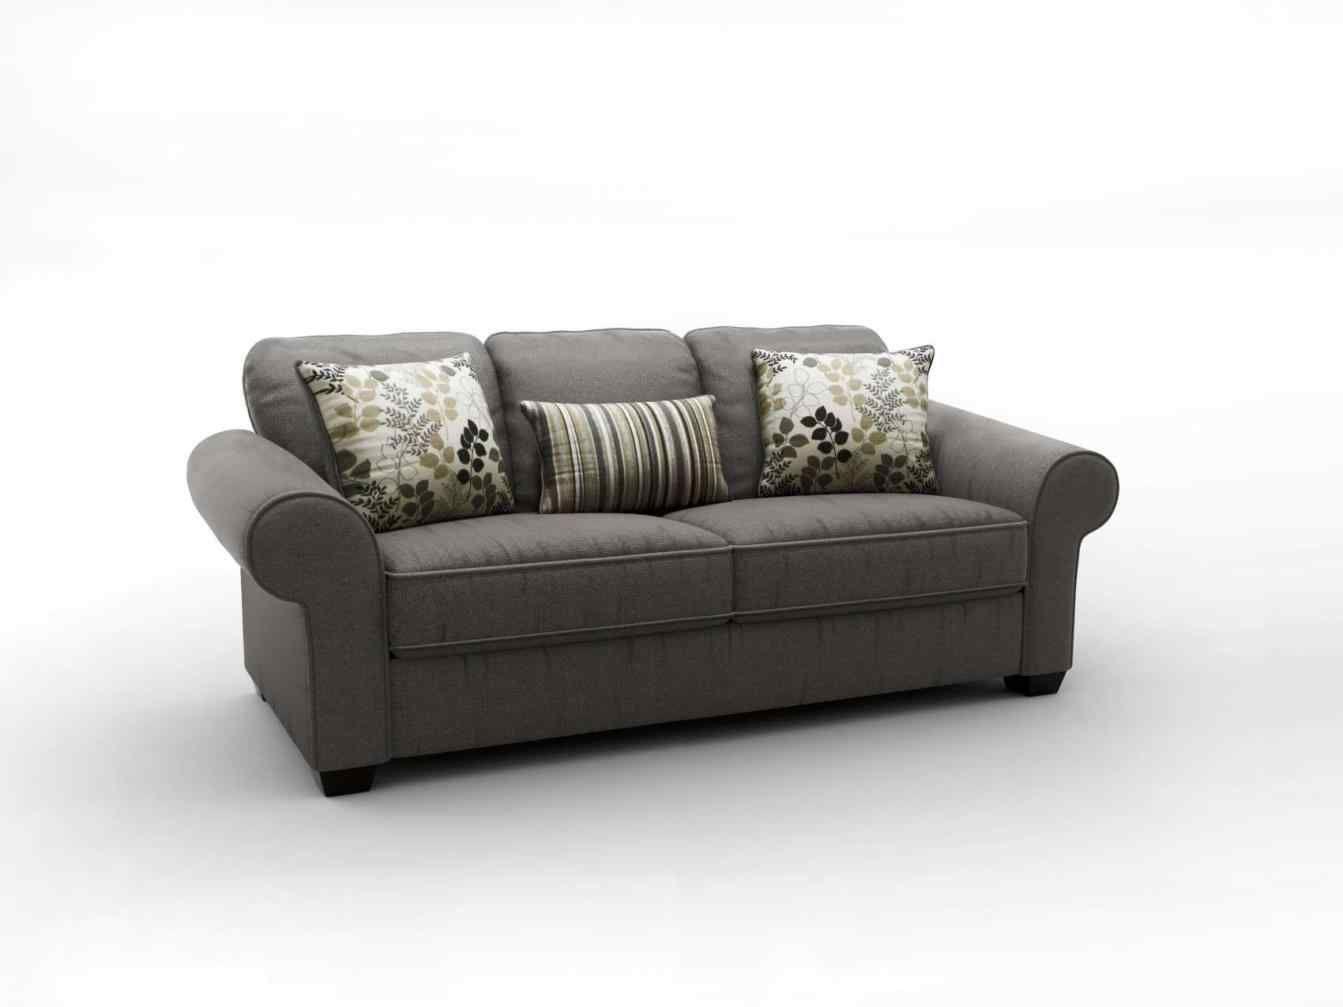 dusk by ashley furniture in makonnen charcoal queen sofa sleeper